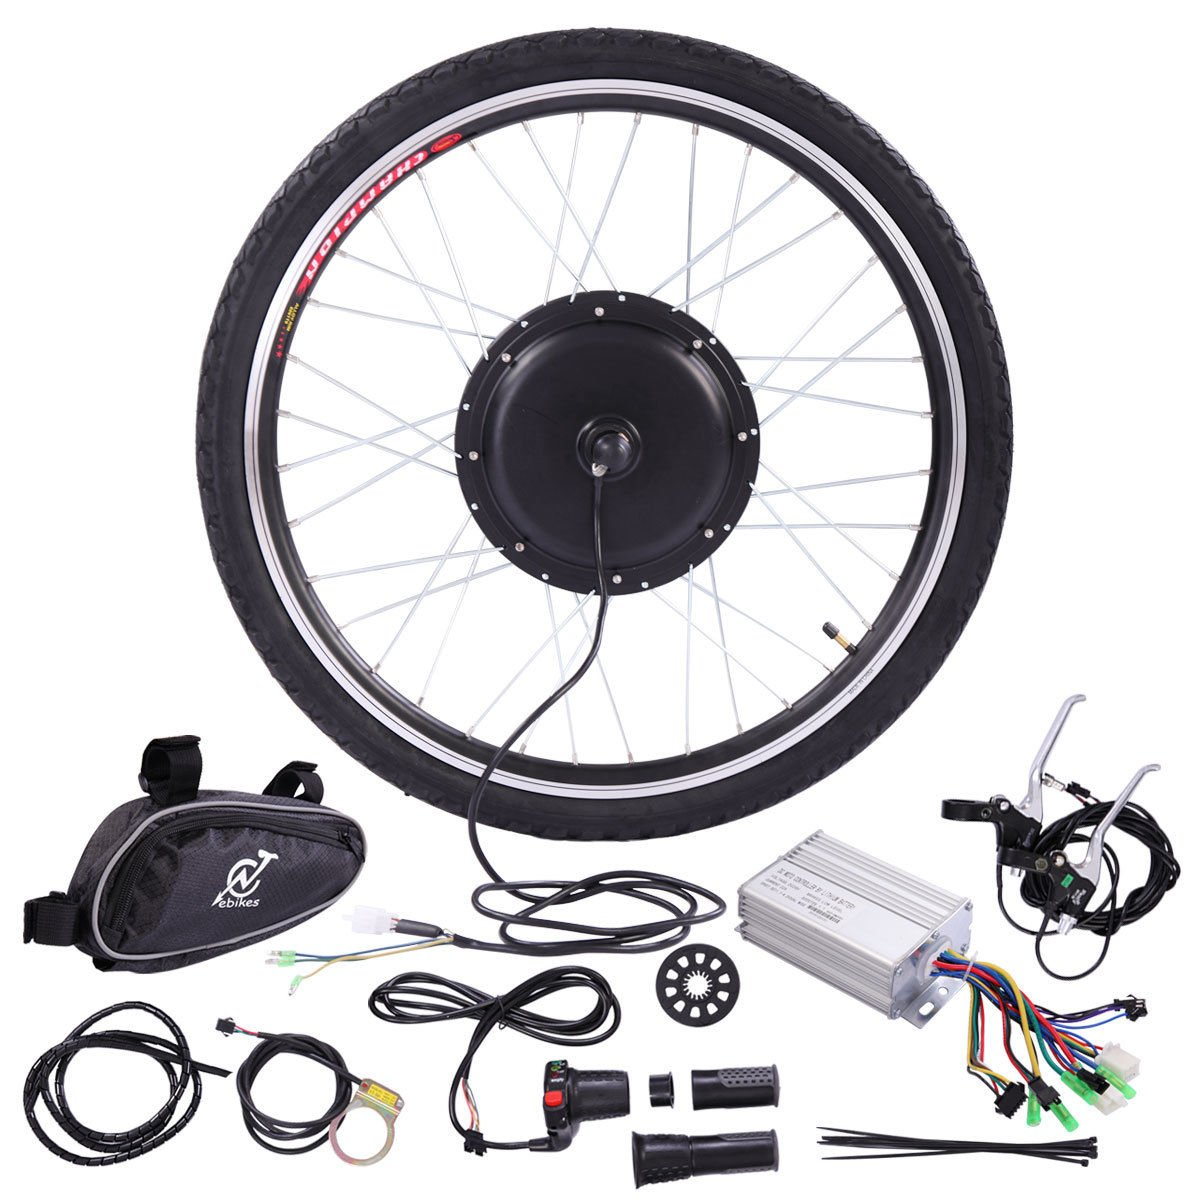 JAXPETY 36V 500W Electric Bicycle Cycle 26'' E Bike Front Wheel Ebike Hub Motor Conversion Kit Hub Motor Wheel